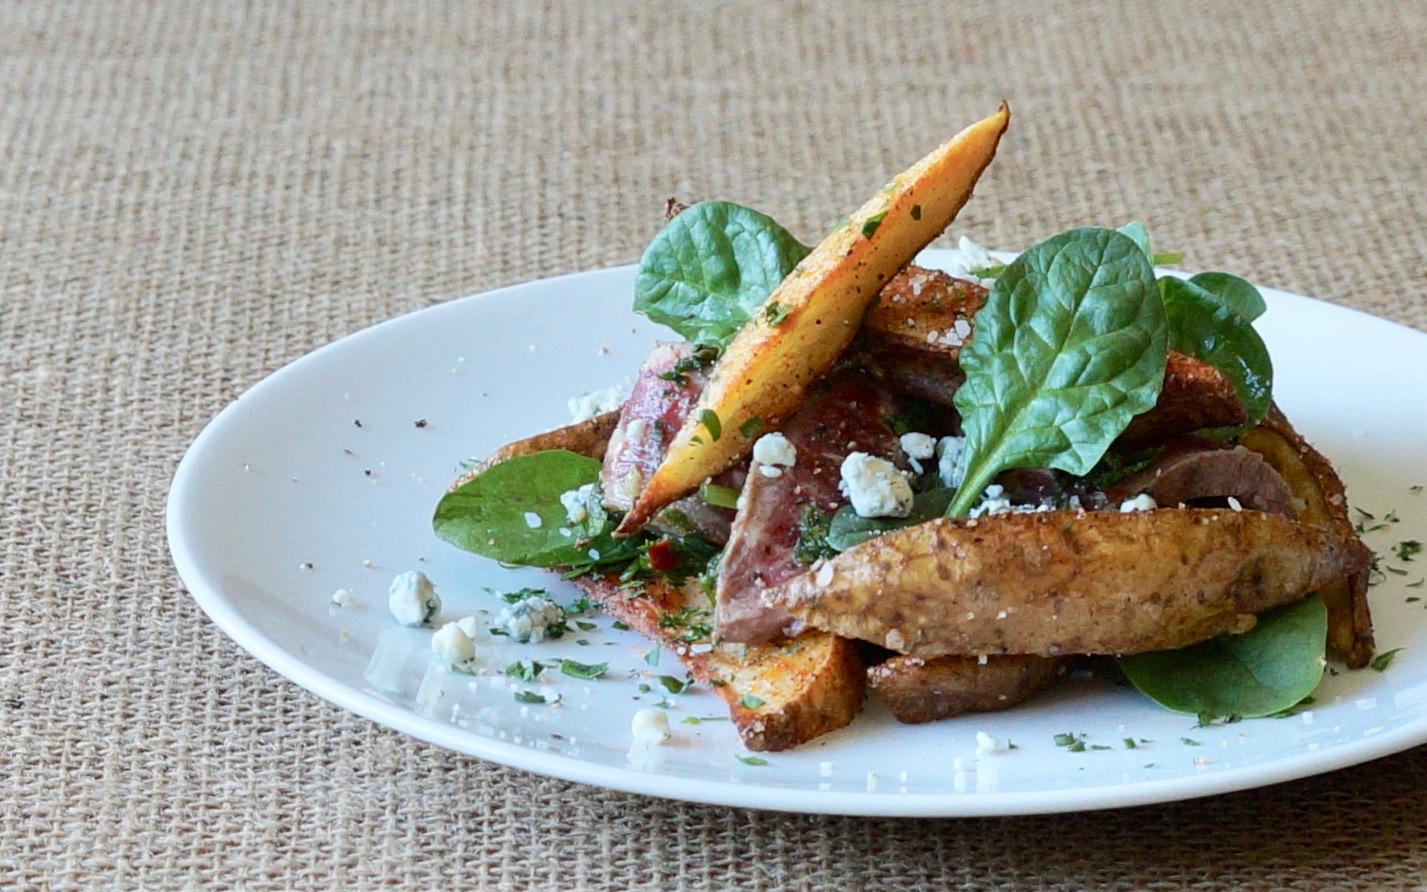 Chimichurri-Steak-Potato-Salad-Rebecca-Gordon-Publisher-Buttermilk-Lipstick-Culinary-Entertaining-Techniques-Southern-Hostess-RebeccaGordon-Pastry-Chef-Birmingham-Alabama